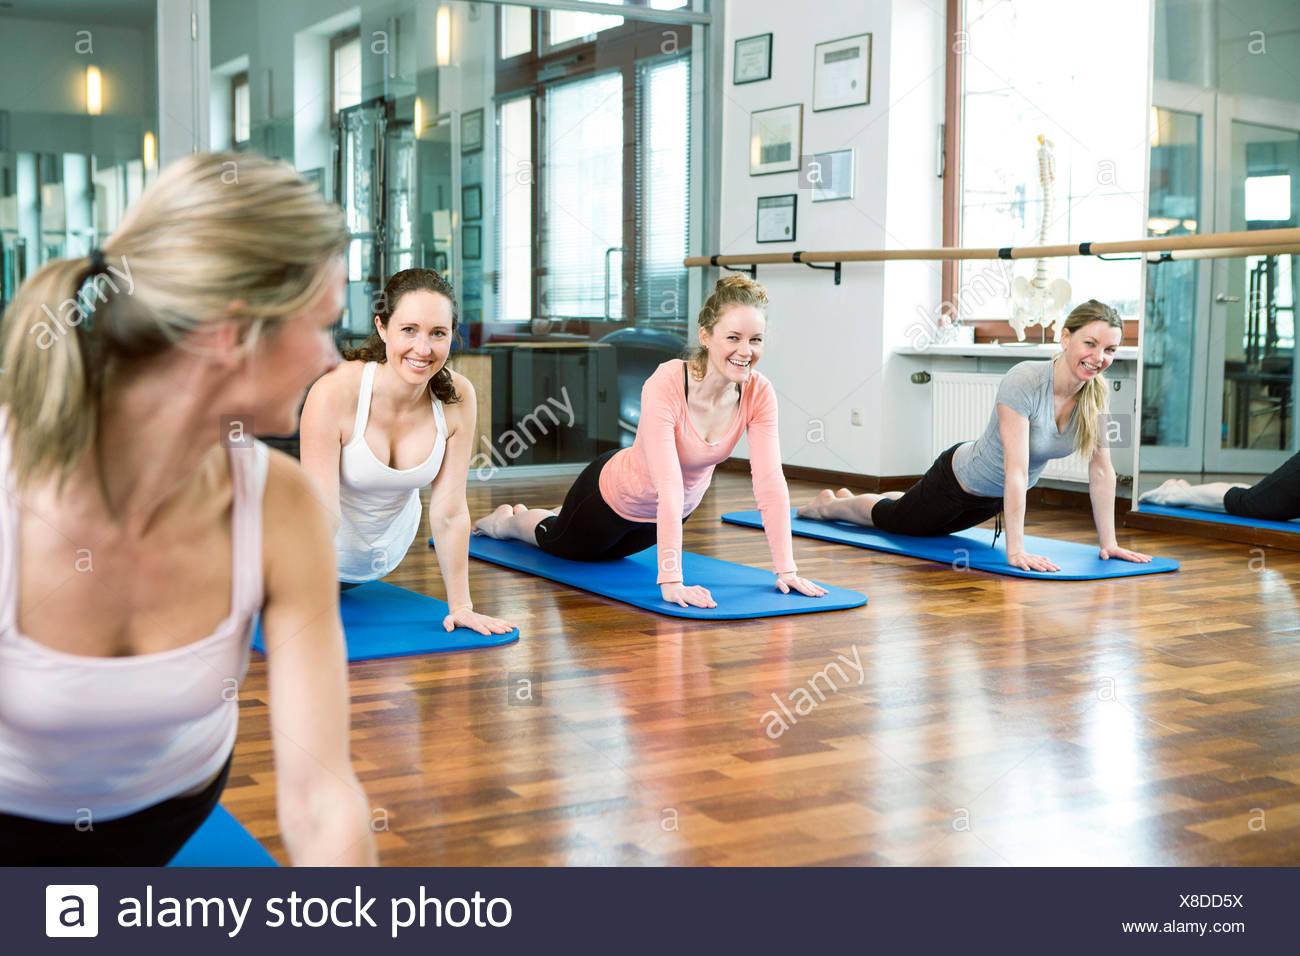 Group of women doing Pilates exercises - Stock Image